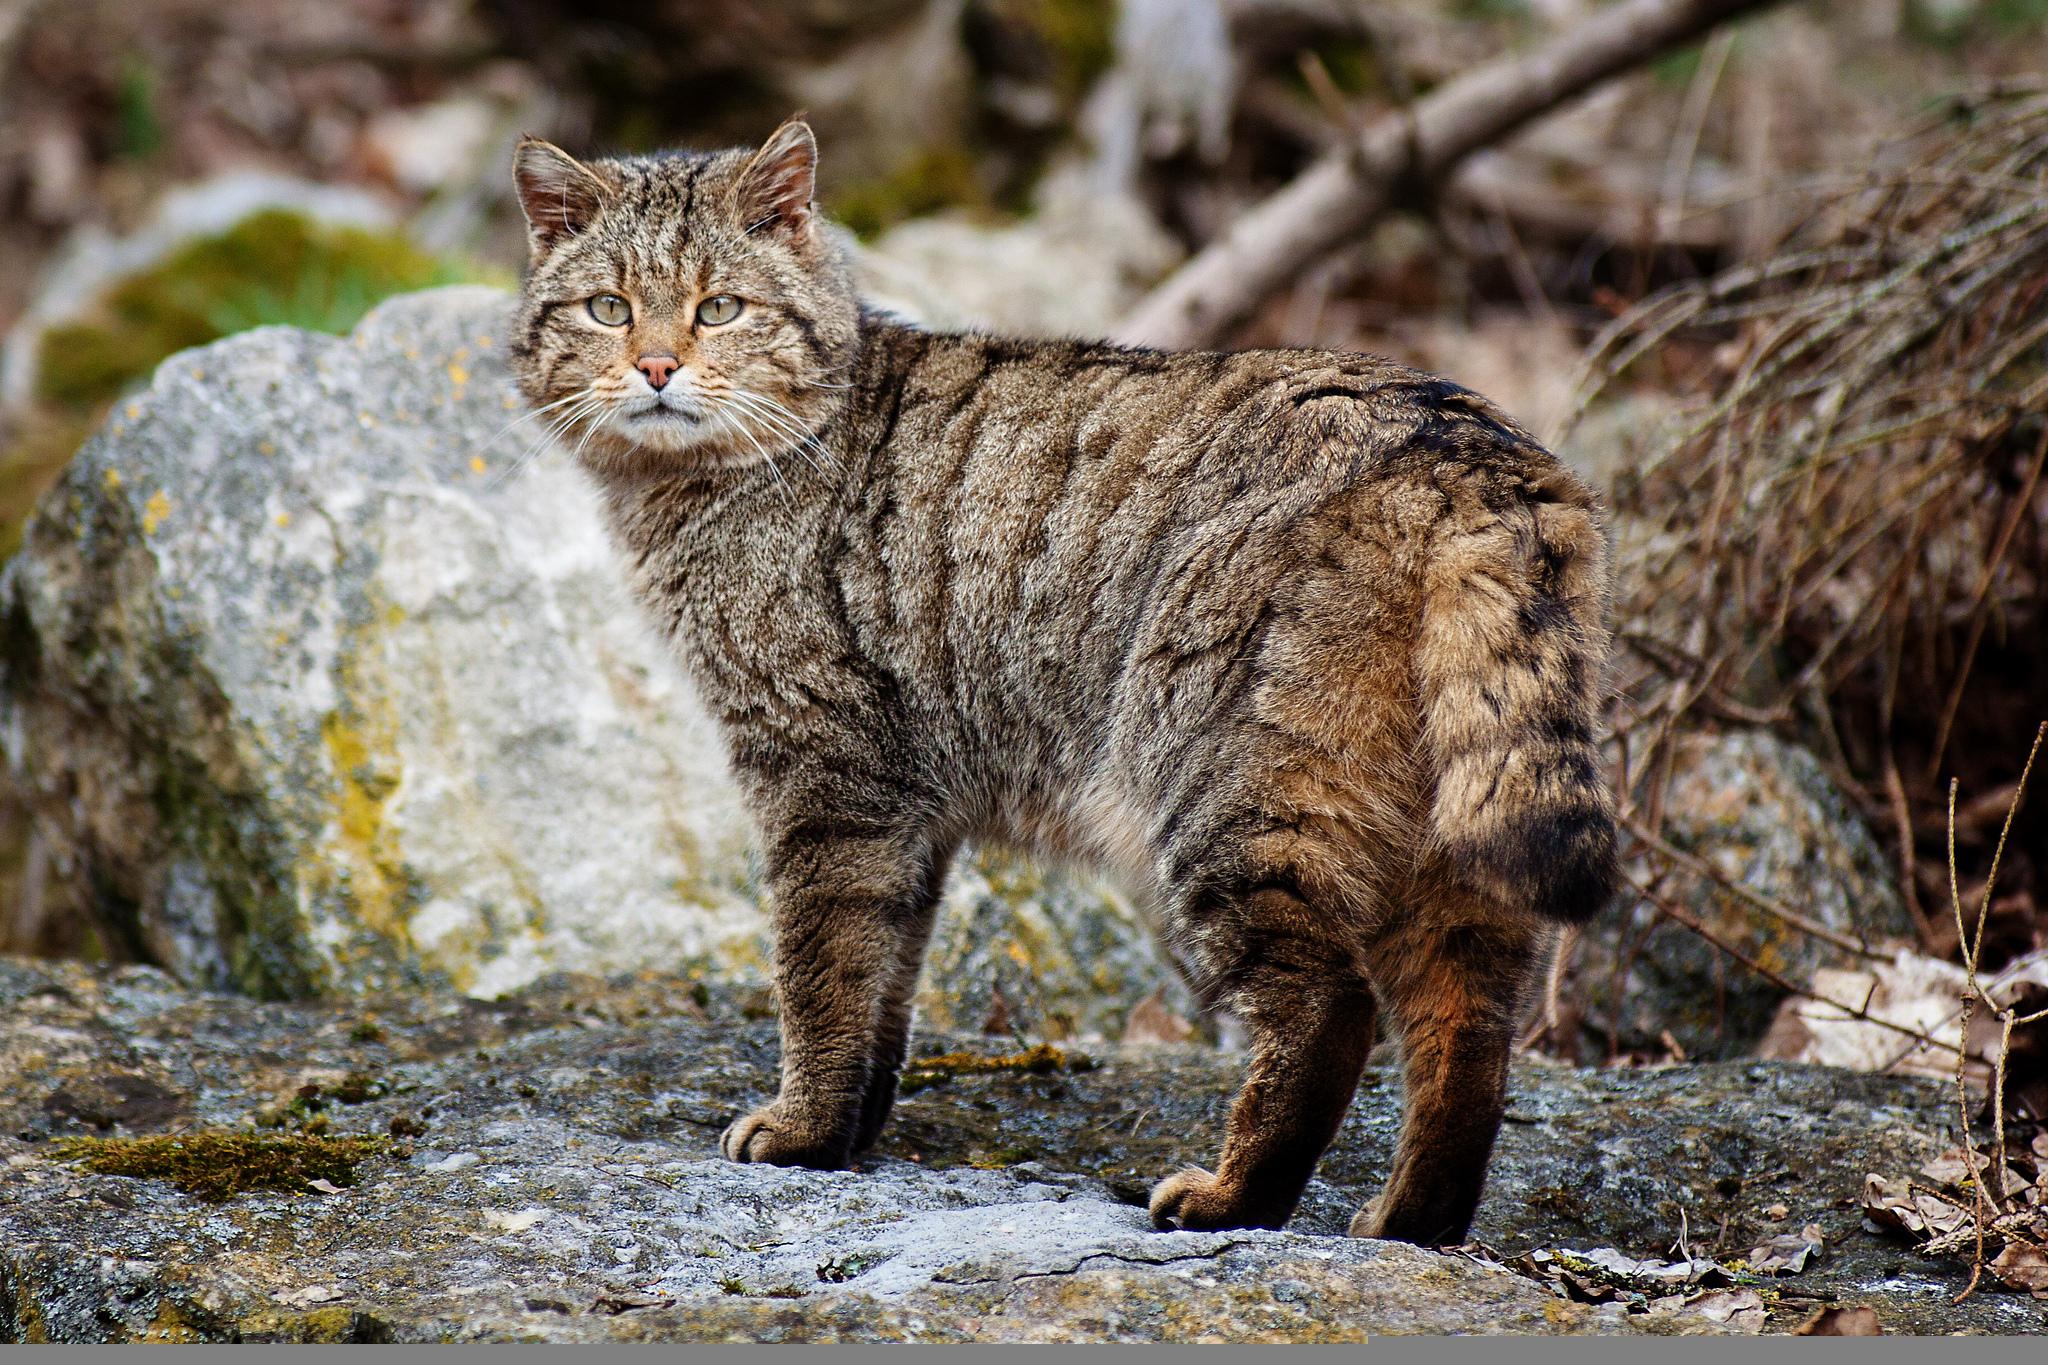 Кот на камушках  № 530476 бесплатно